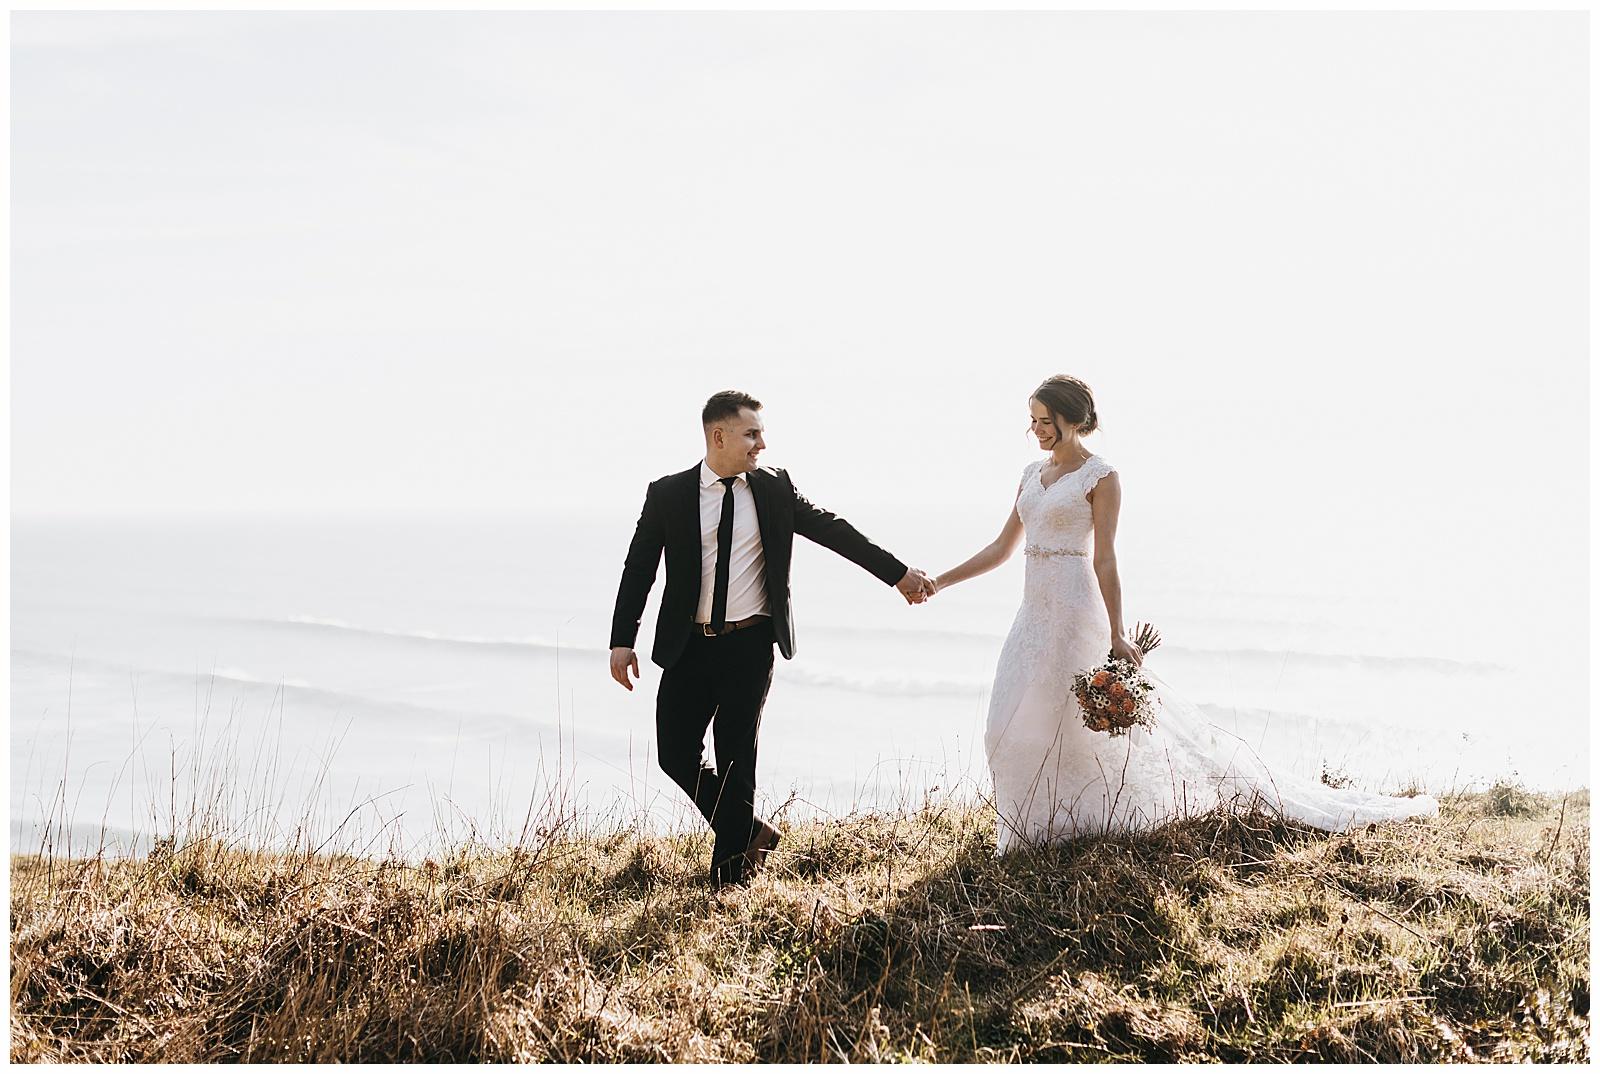 Ecola State Park Elopement Oregon Wedding Photographer Annie Zav Photography_0482.jpg